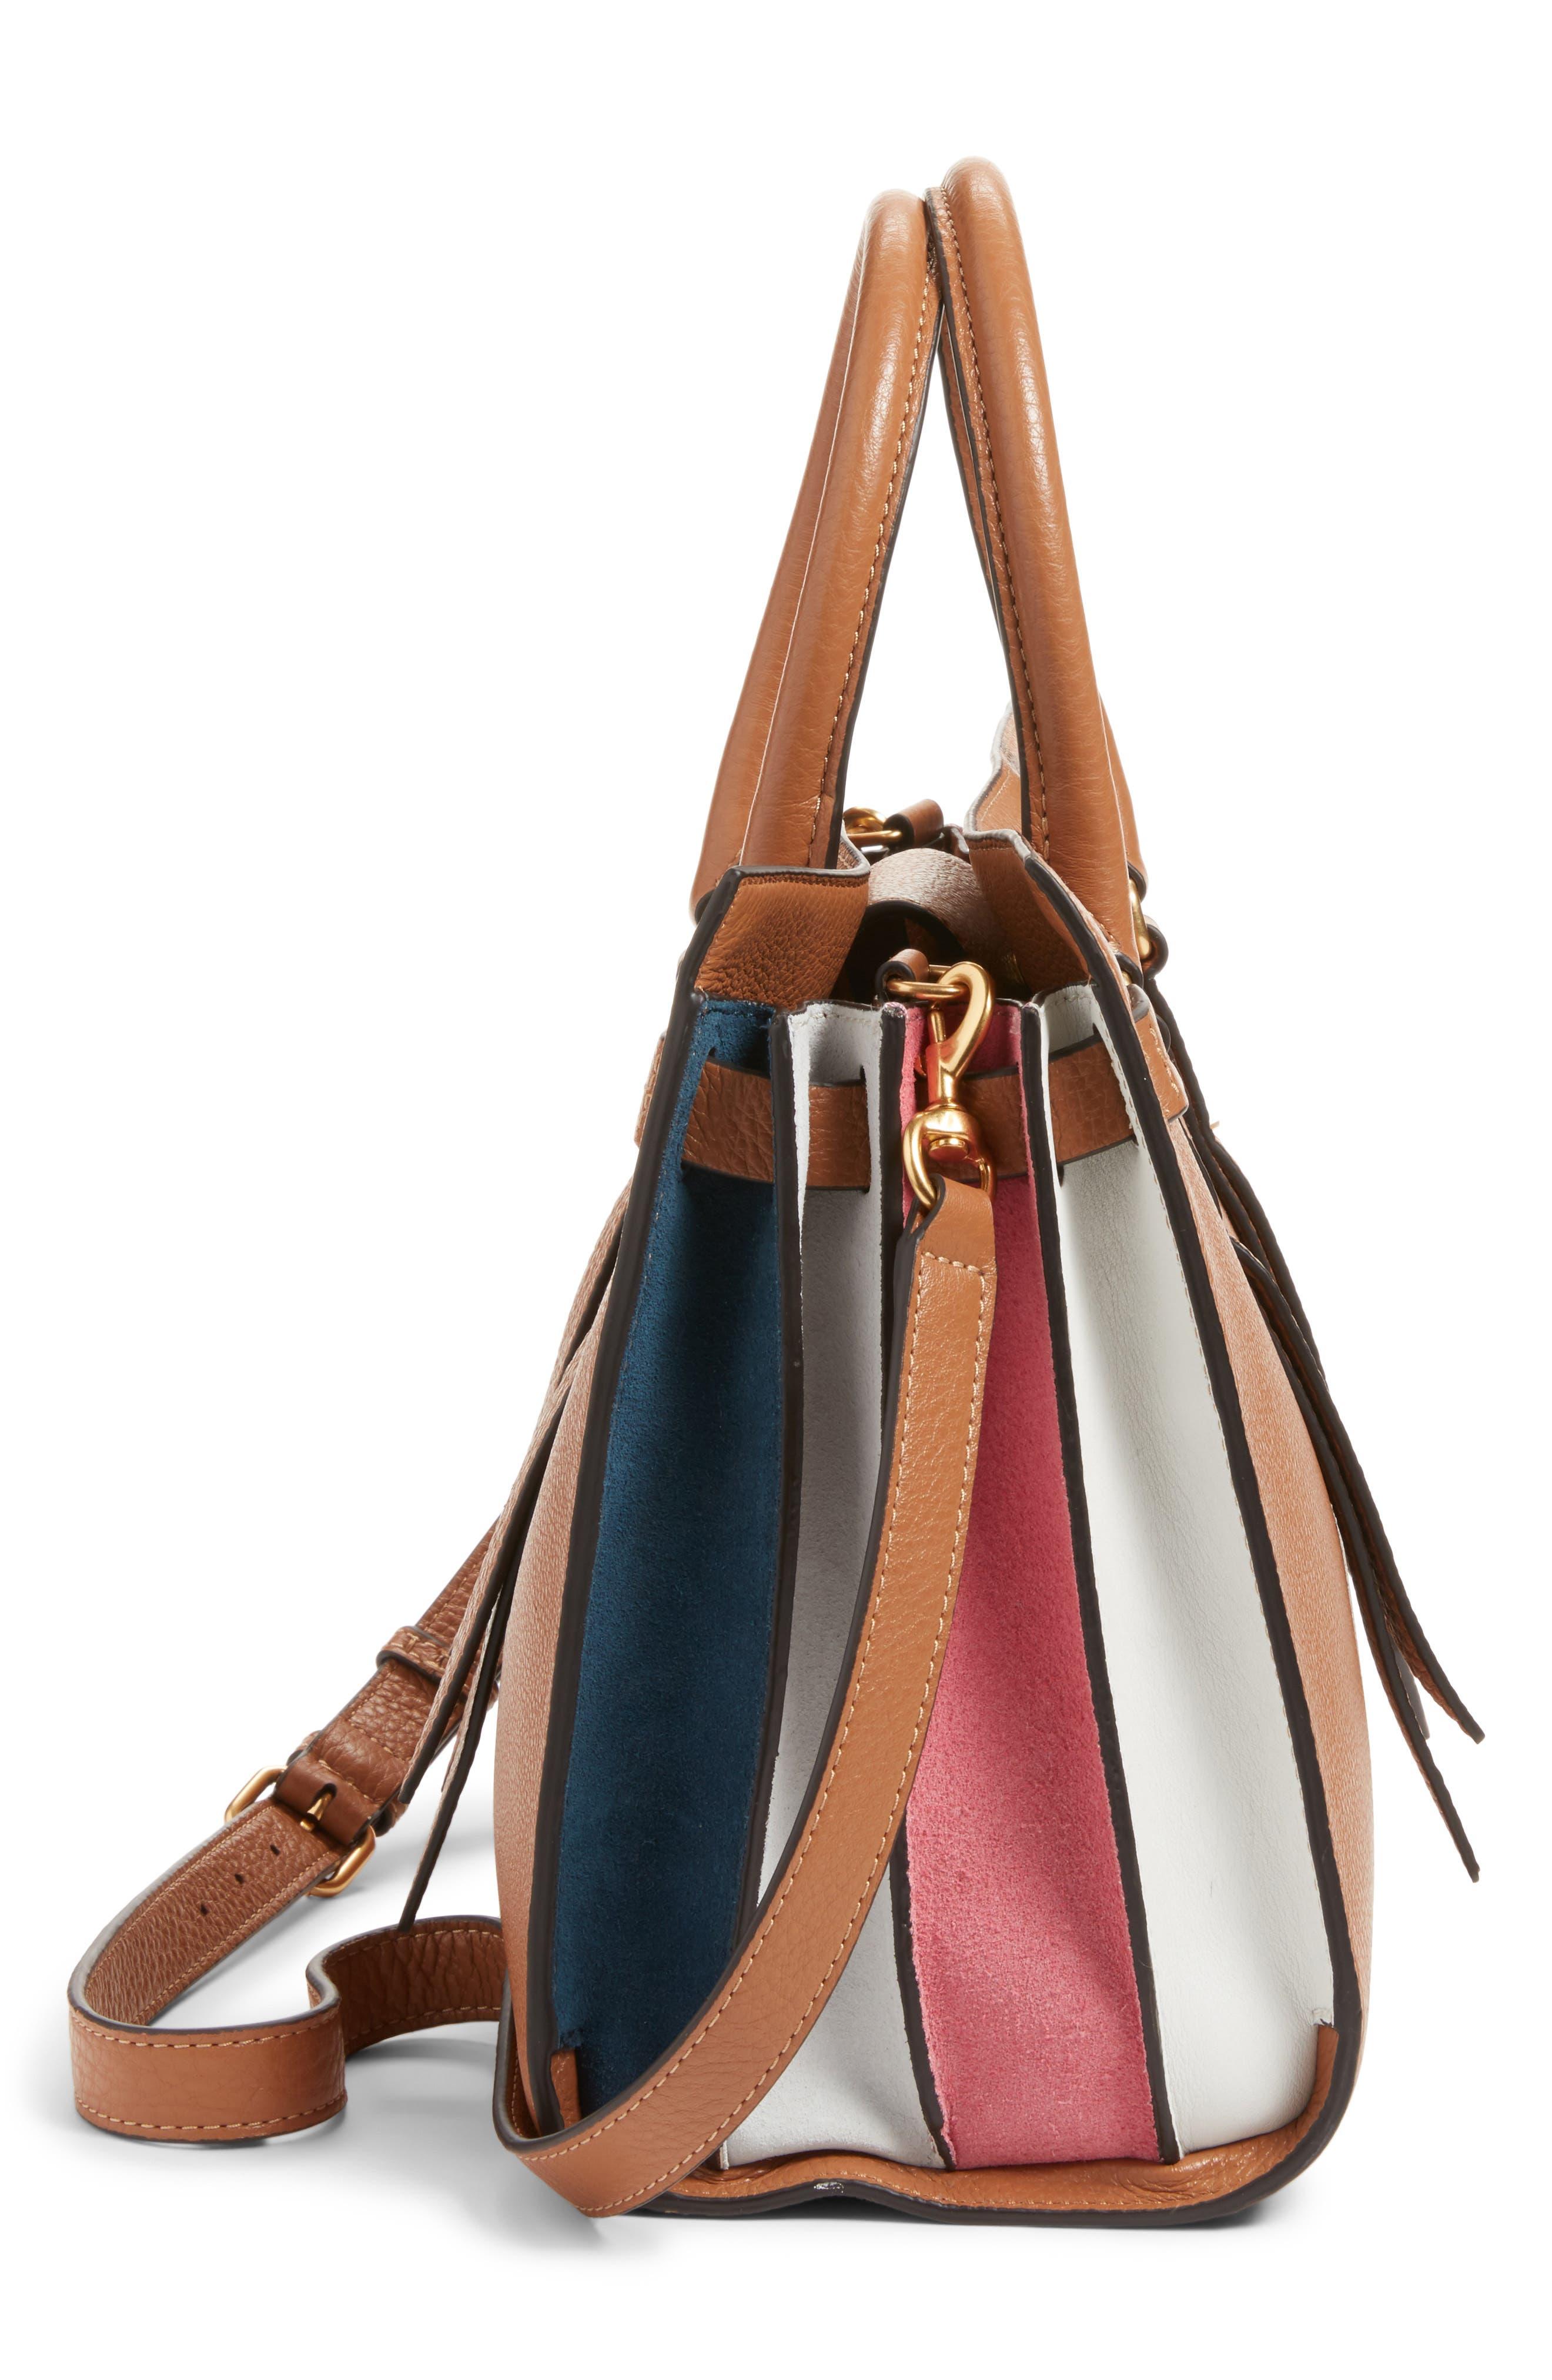 Sherry Calfskin Leather Satchel,                             Alternate thumbnail 5, color,                             Almond Multi